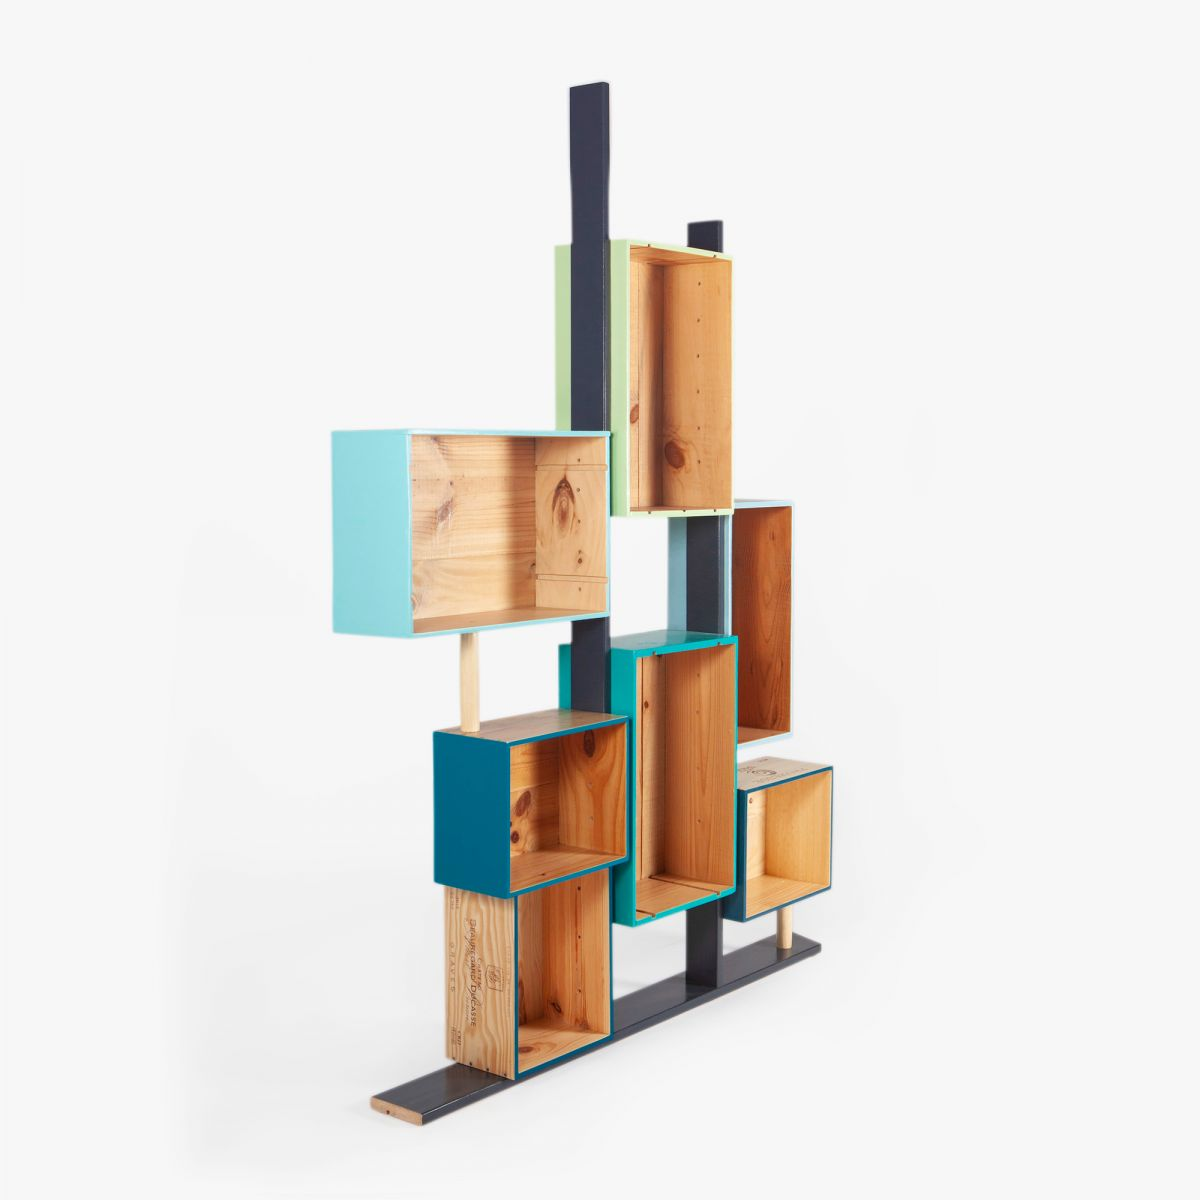 etagere bibliotheque caisses bleu vertes design bois massif